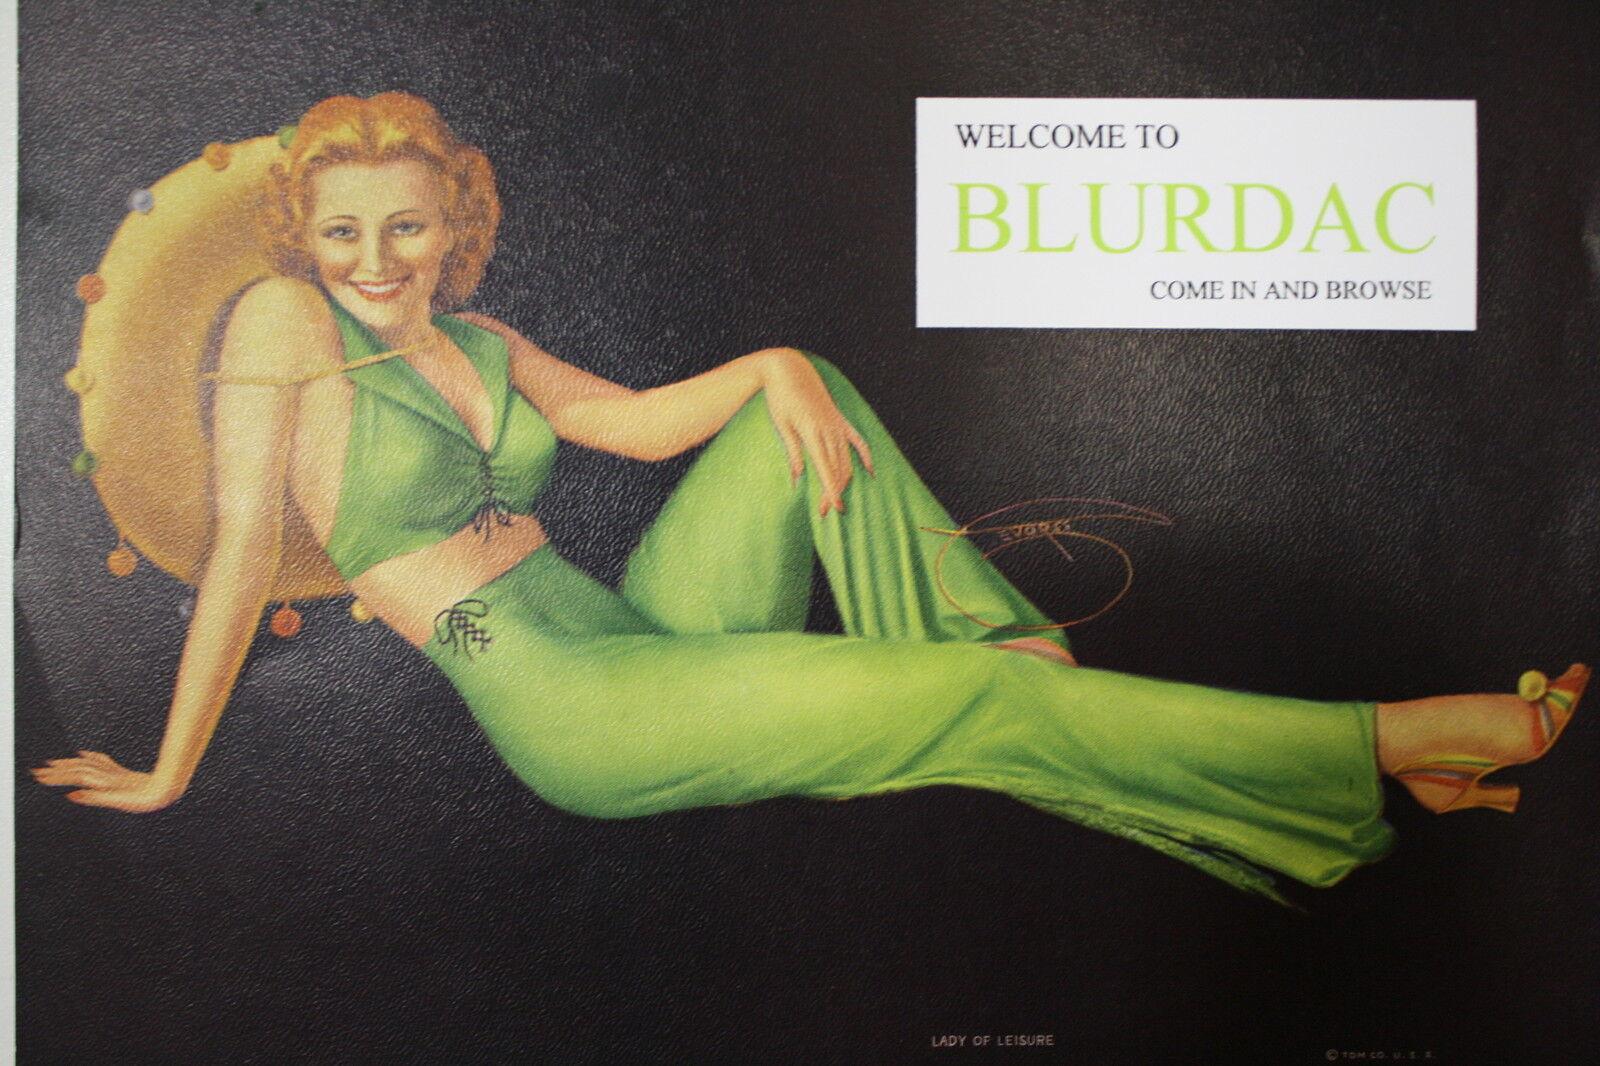 blurdac